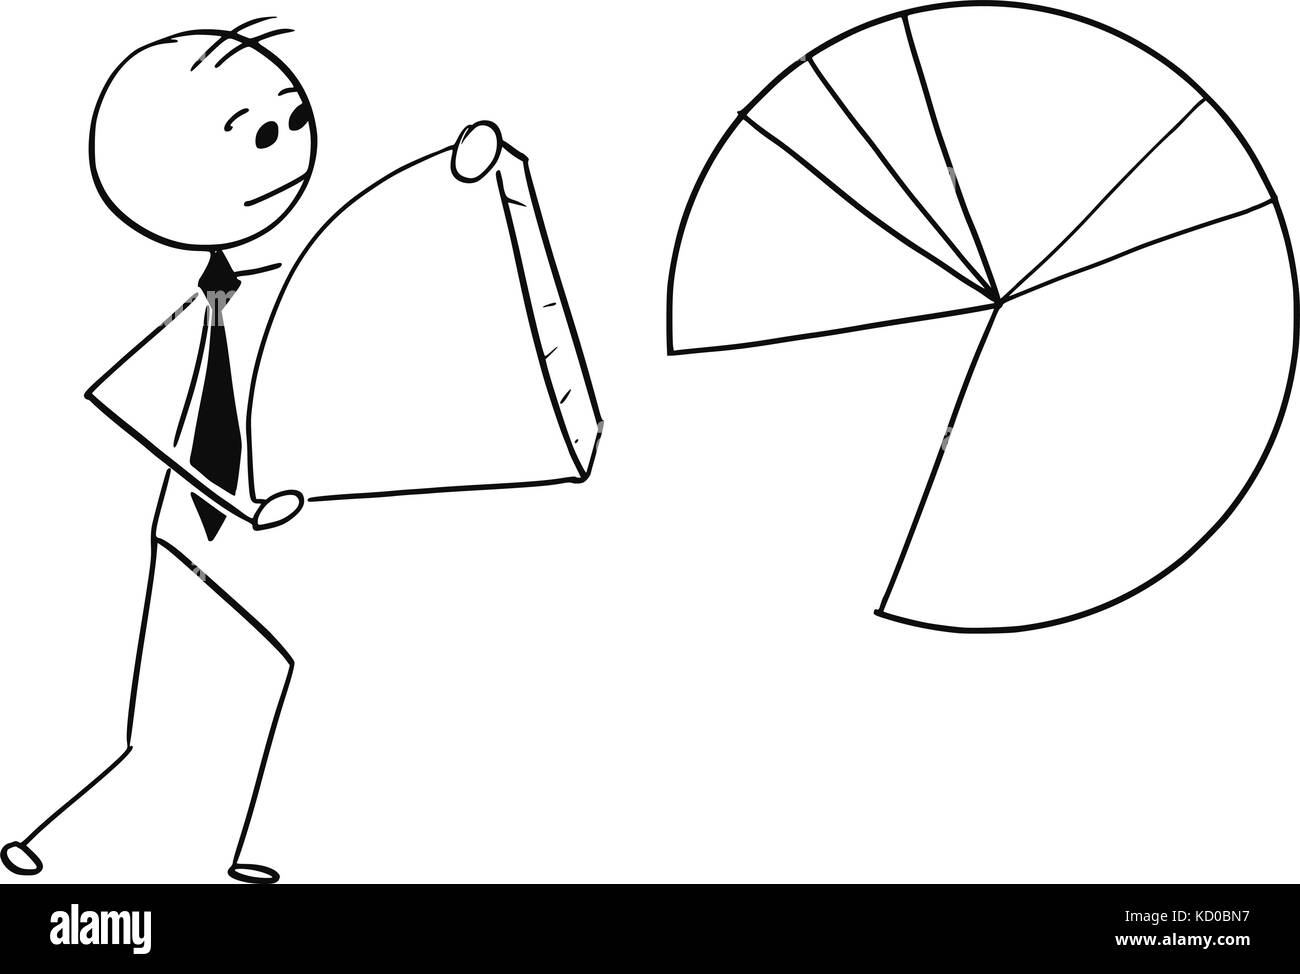 Pie chart cake stock photos pie chart cake stock images alamy cartoon stick man illustration of businessman carry piece of pie chart graph stock image nvjuhfo Images